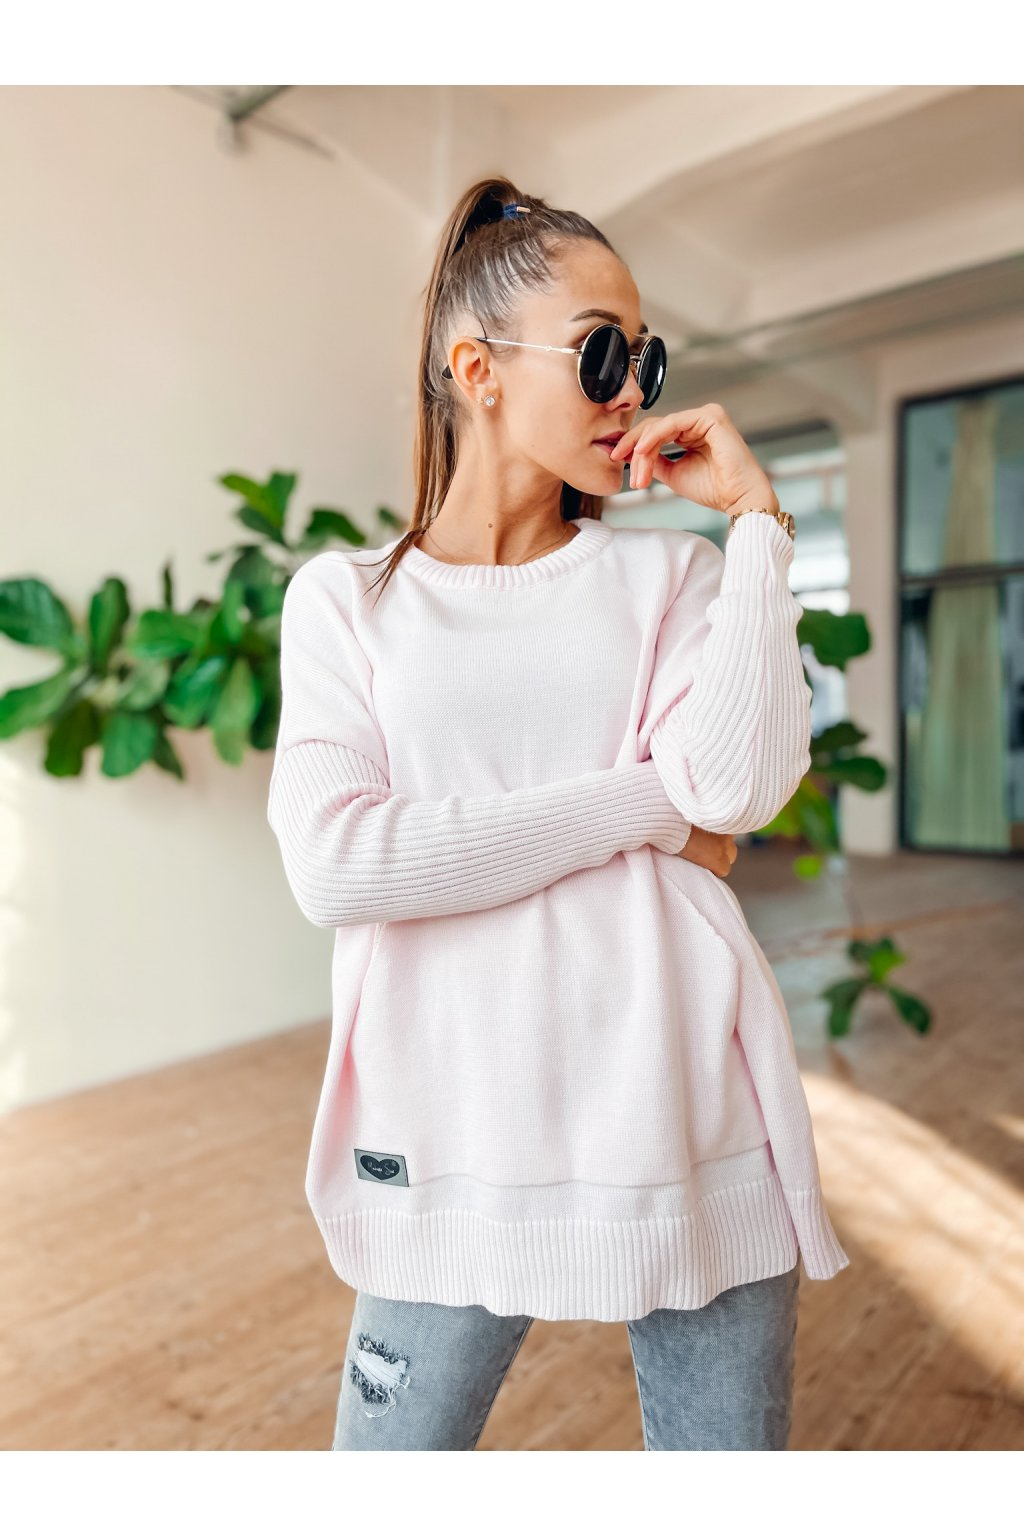 damsky svetr s kapsou spring light pink eshopat cz 1